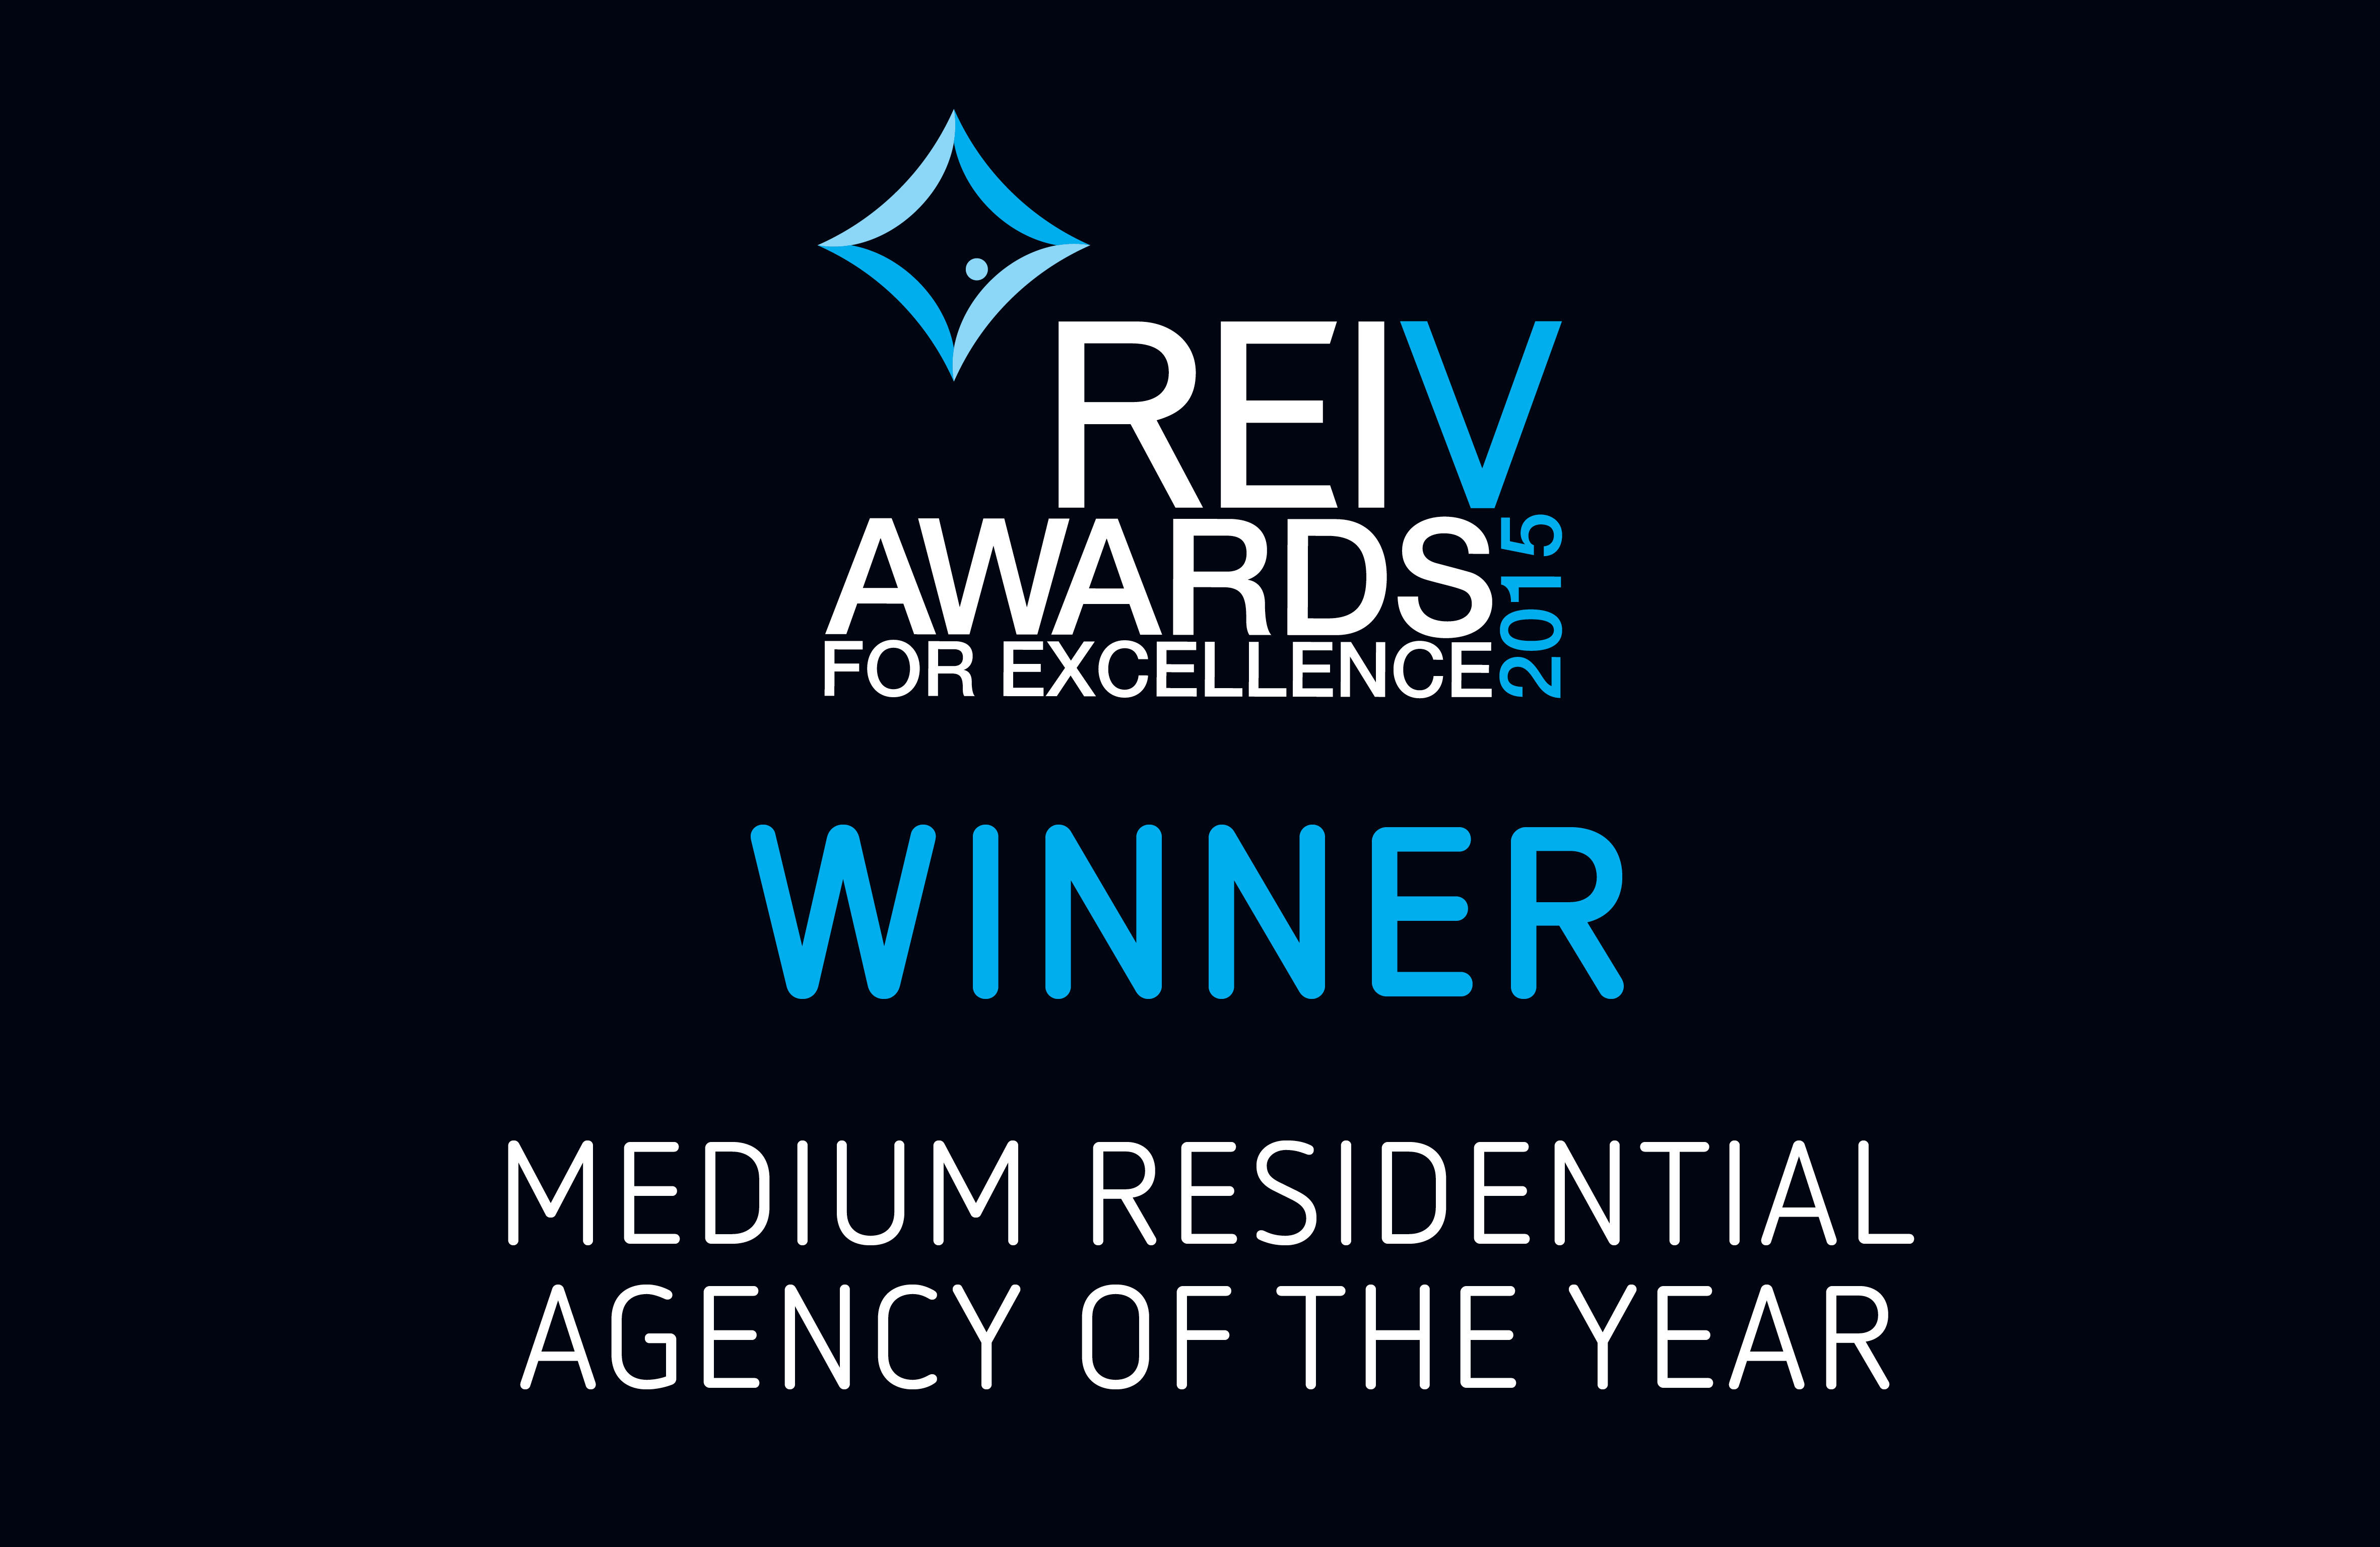 2010 - REIV Medium Residential Agency of the Year